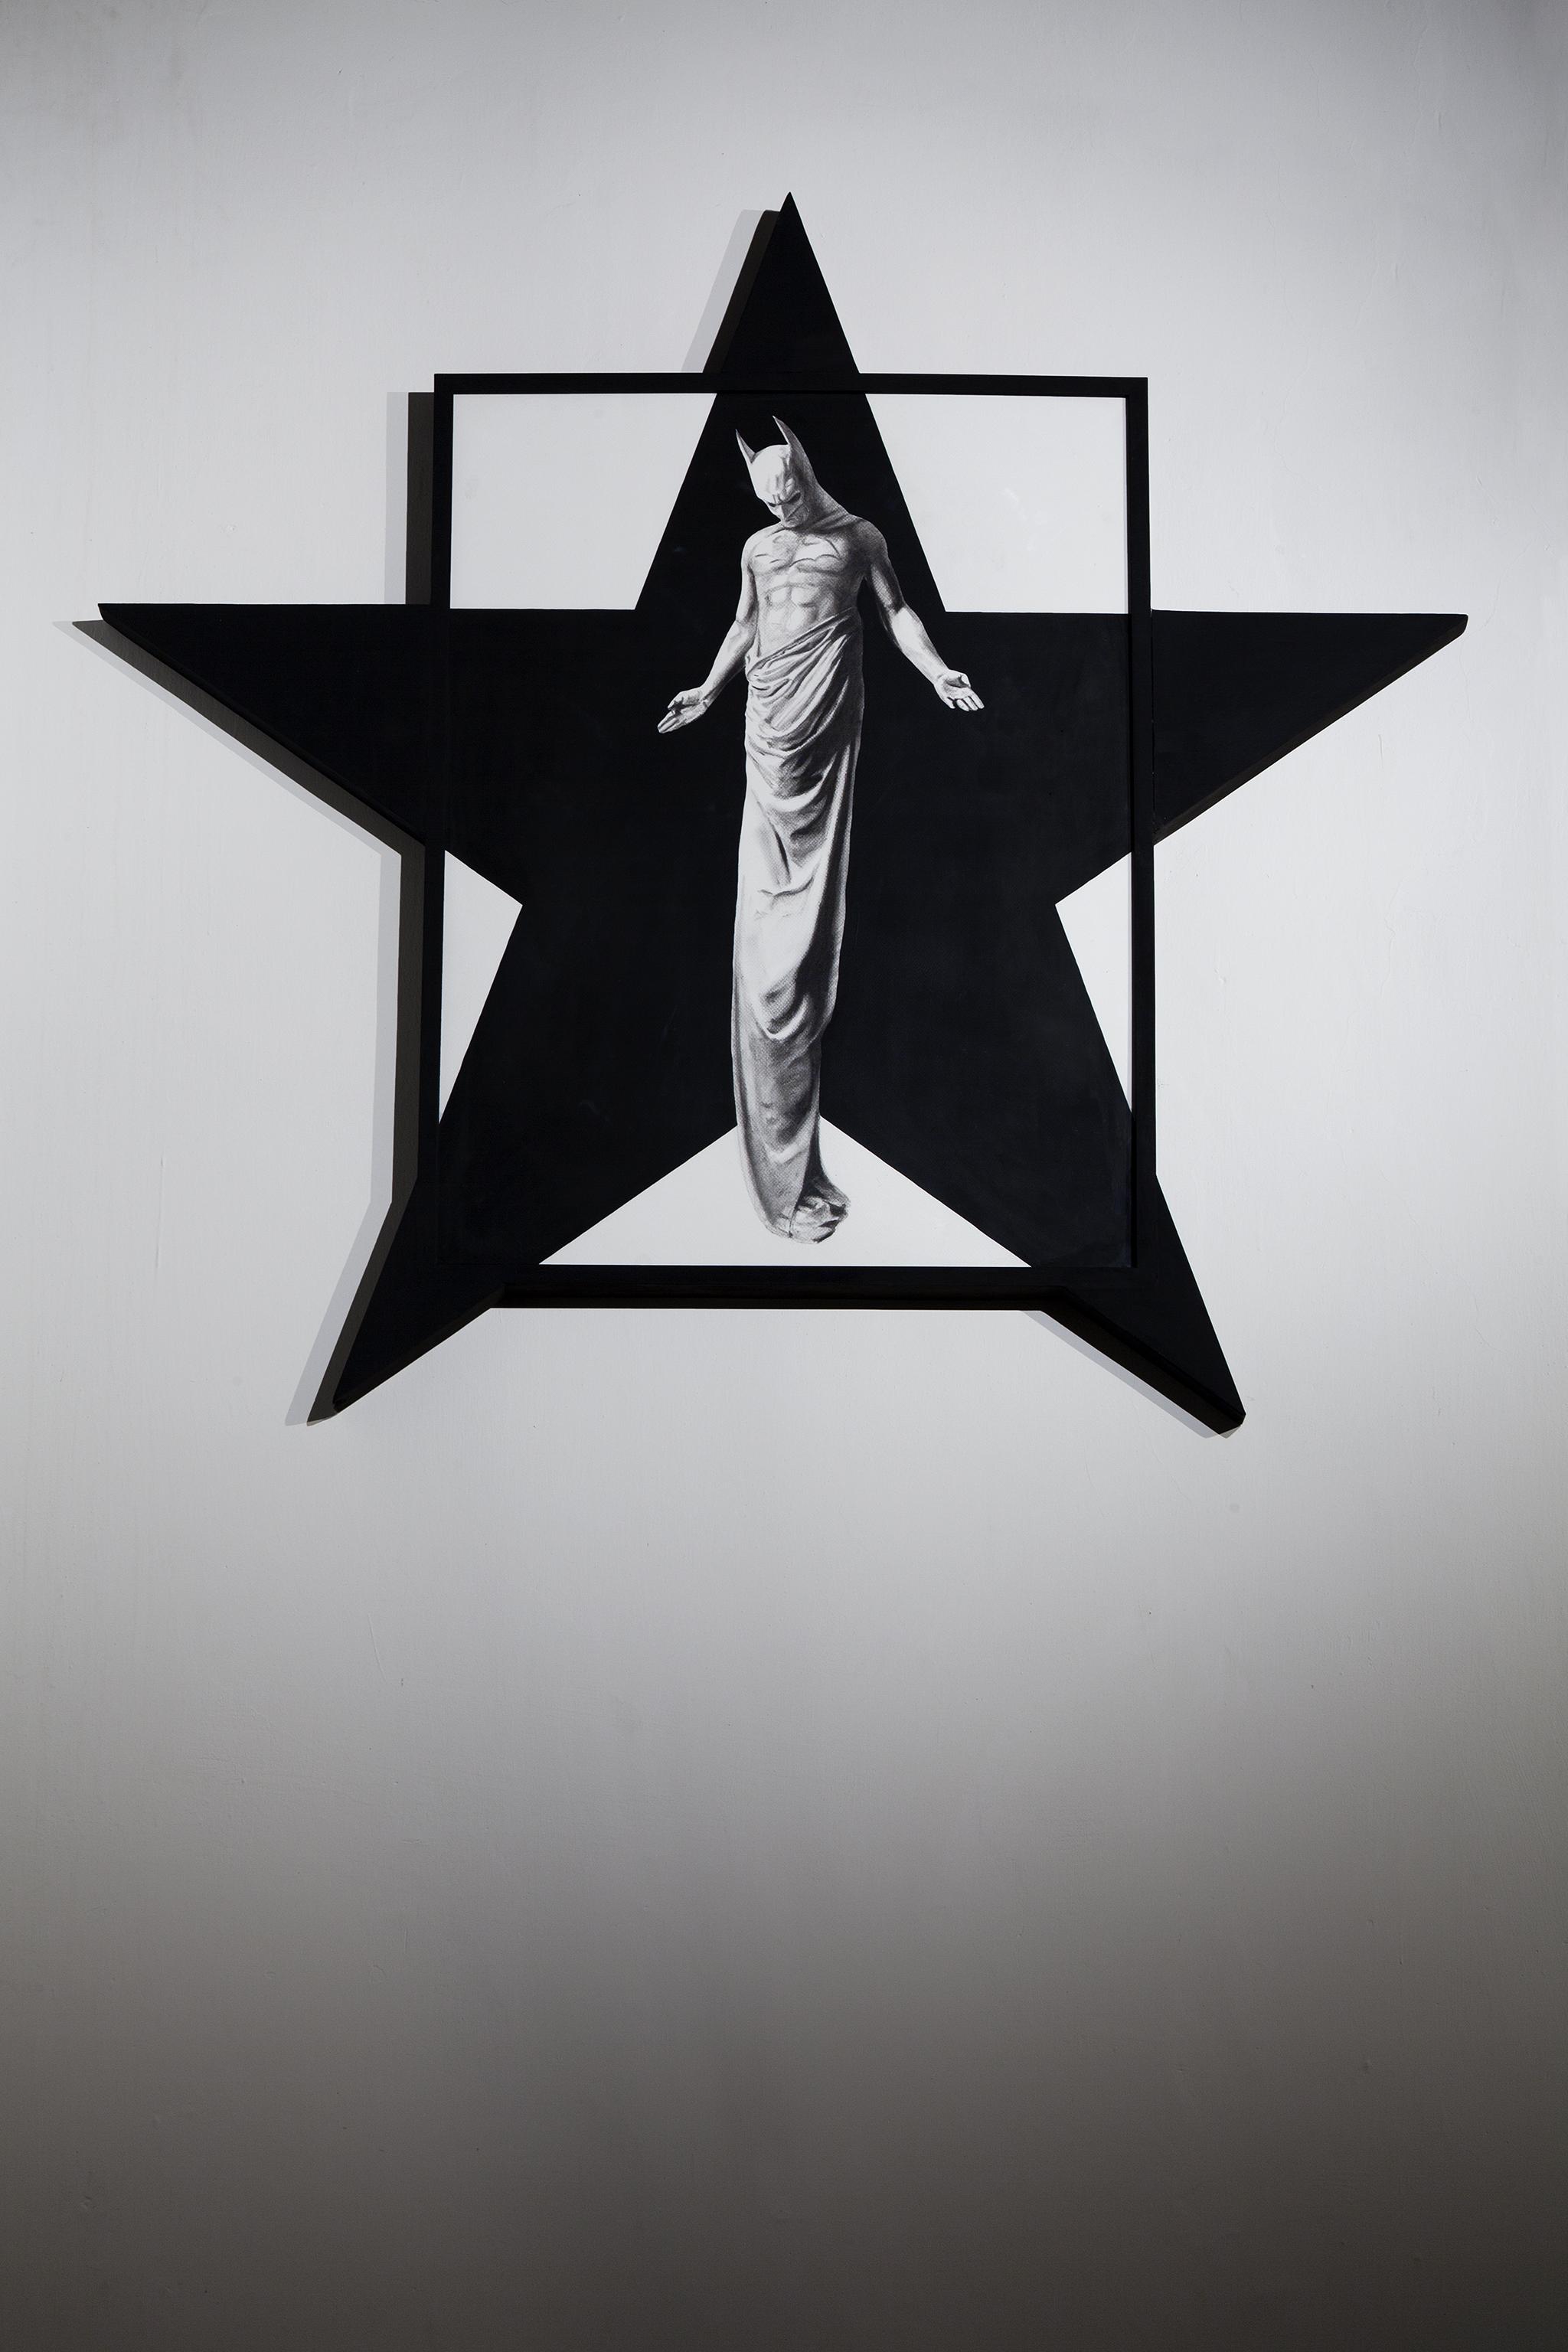 In Excelsis 3 , 2011 . Charcoal, paper, wood, enamel paint, 120x119x 5 cm. Photo: Claudio Abate